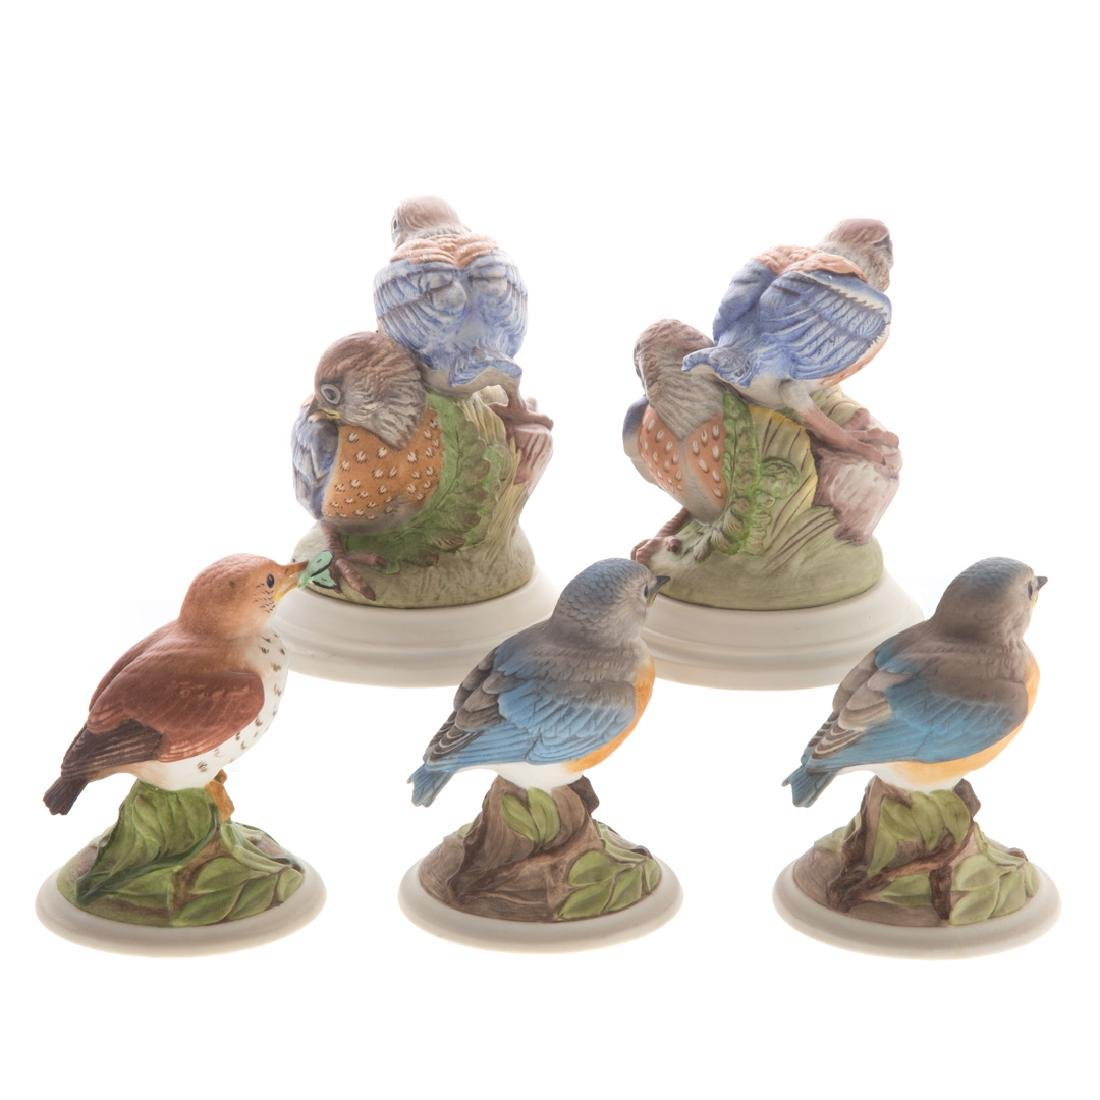 Five Boehm bisque baby/fledging birds - 2